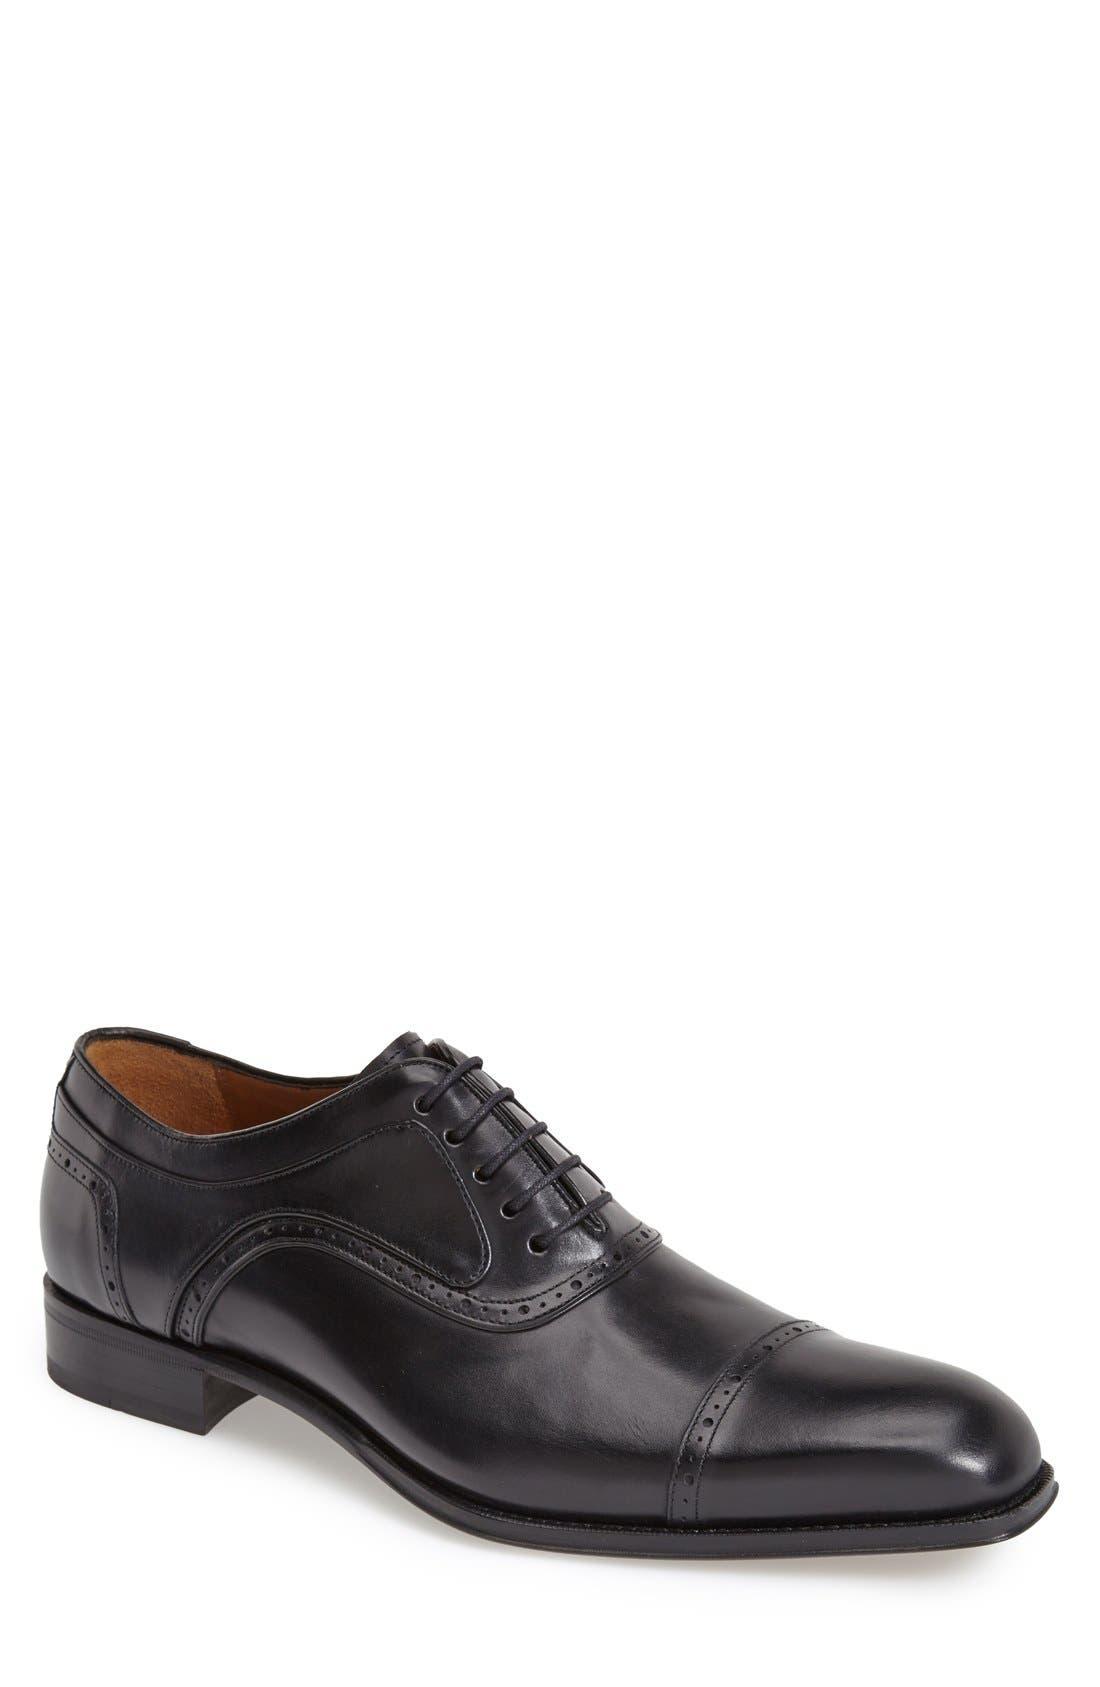 'March' Cap Toe Oxford,                         Main,                         color, BLACK